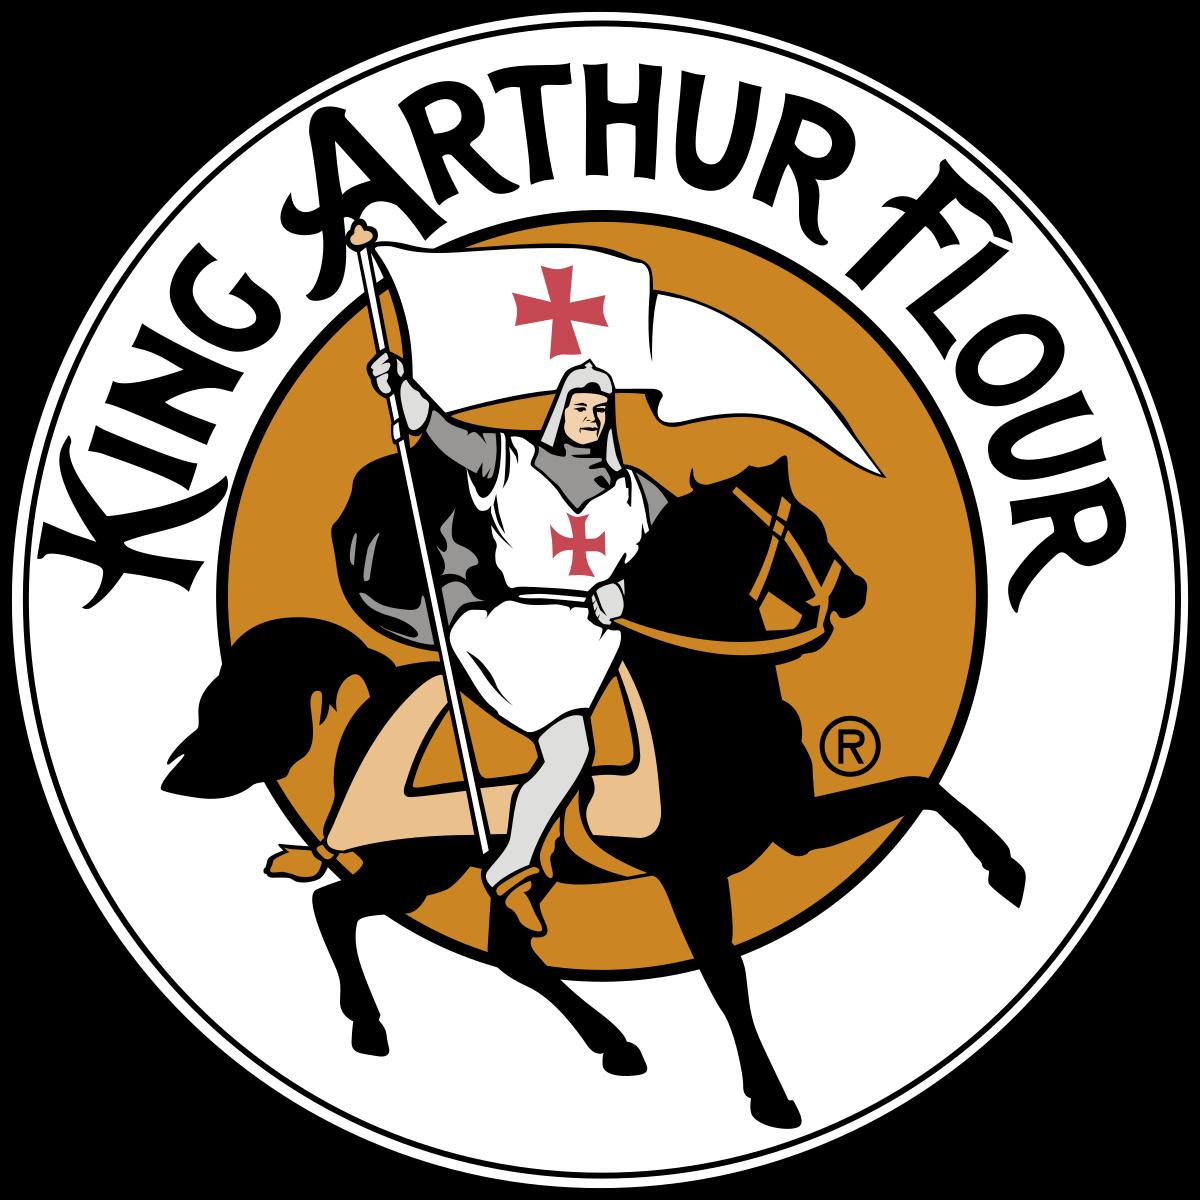 King arthur wikipedia . Flour clipart drawing